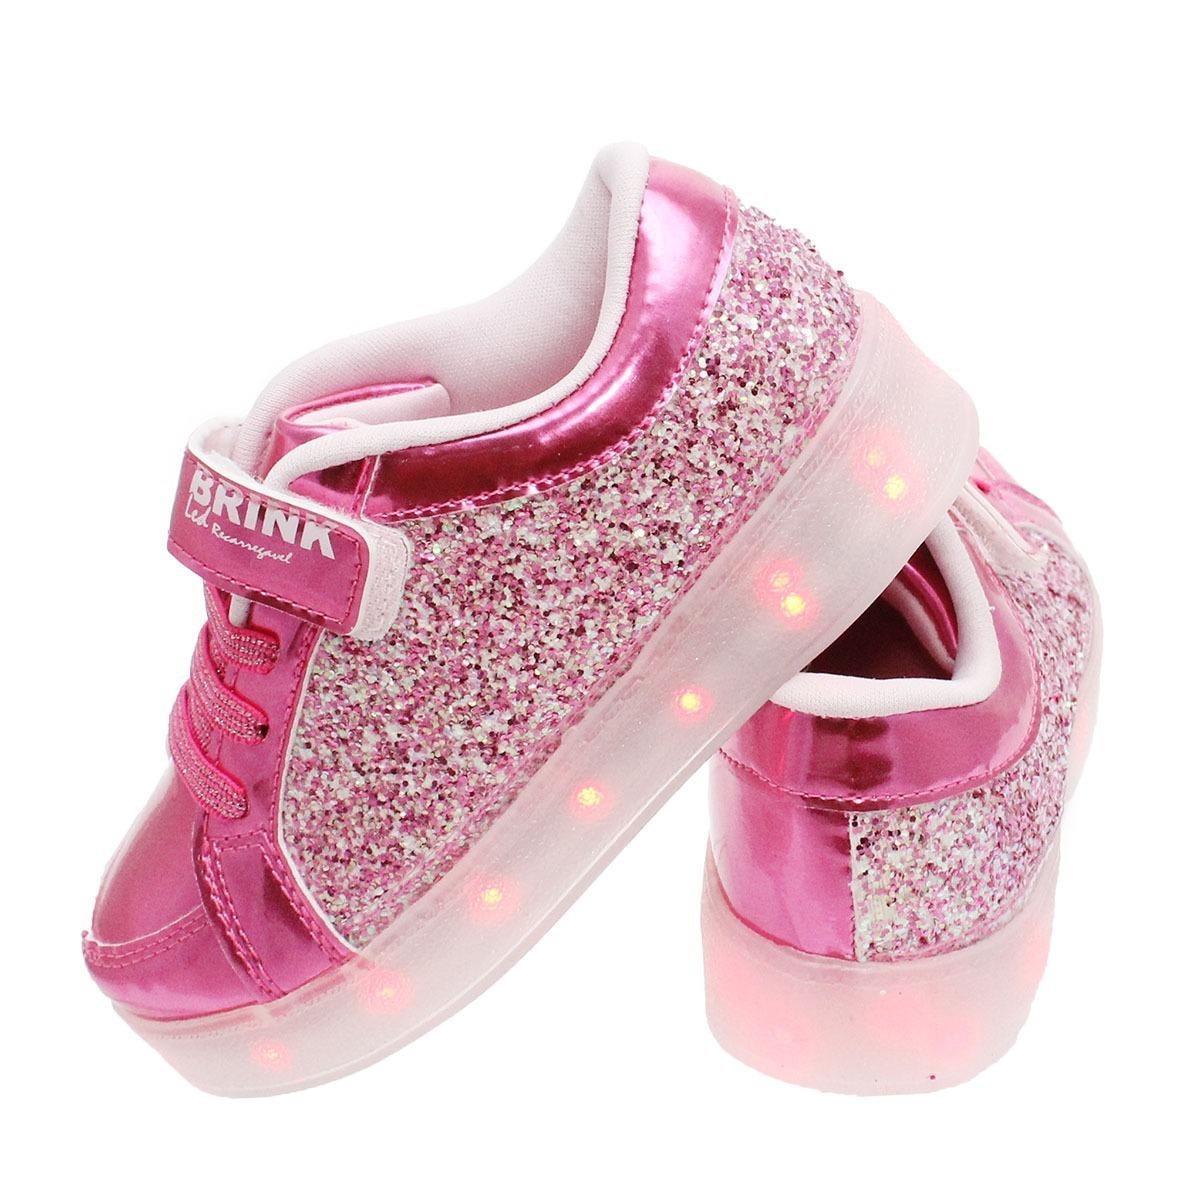 43142246a17d1 tenis led recarregável infantil feminino brink pink gliter. Carregando zoom.